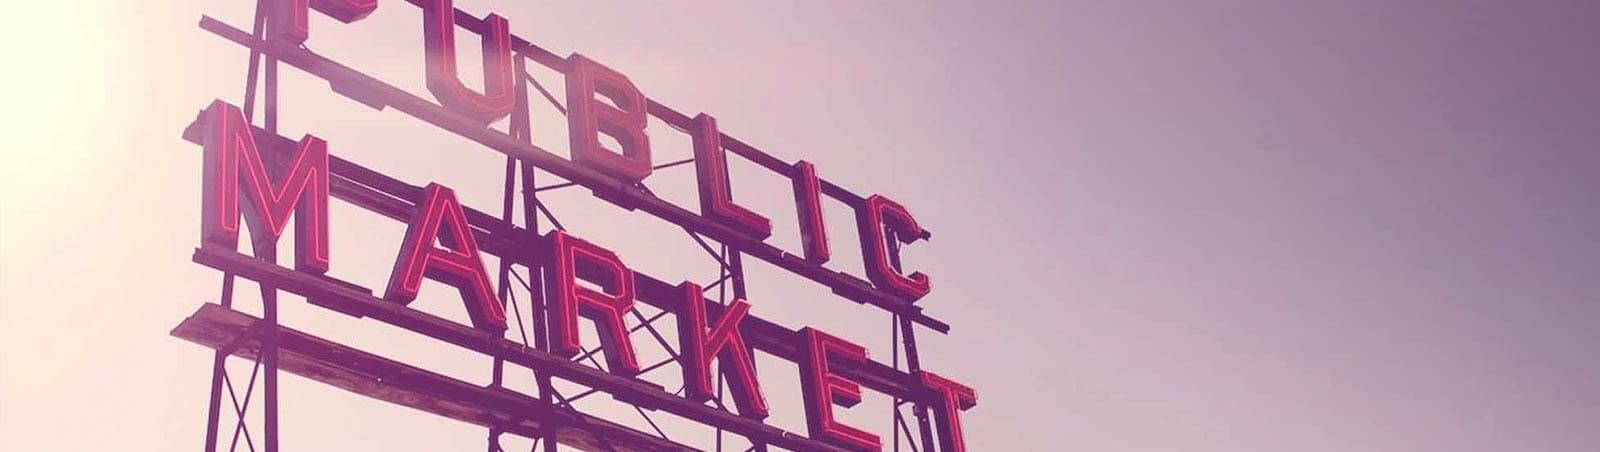 Content Marketing und Social Selling – tinkla.com